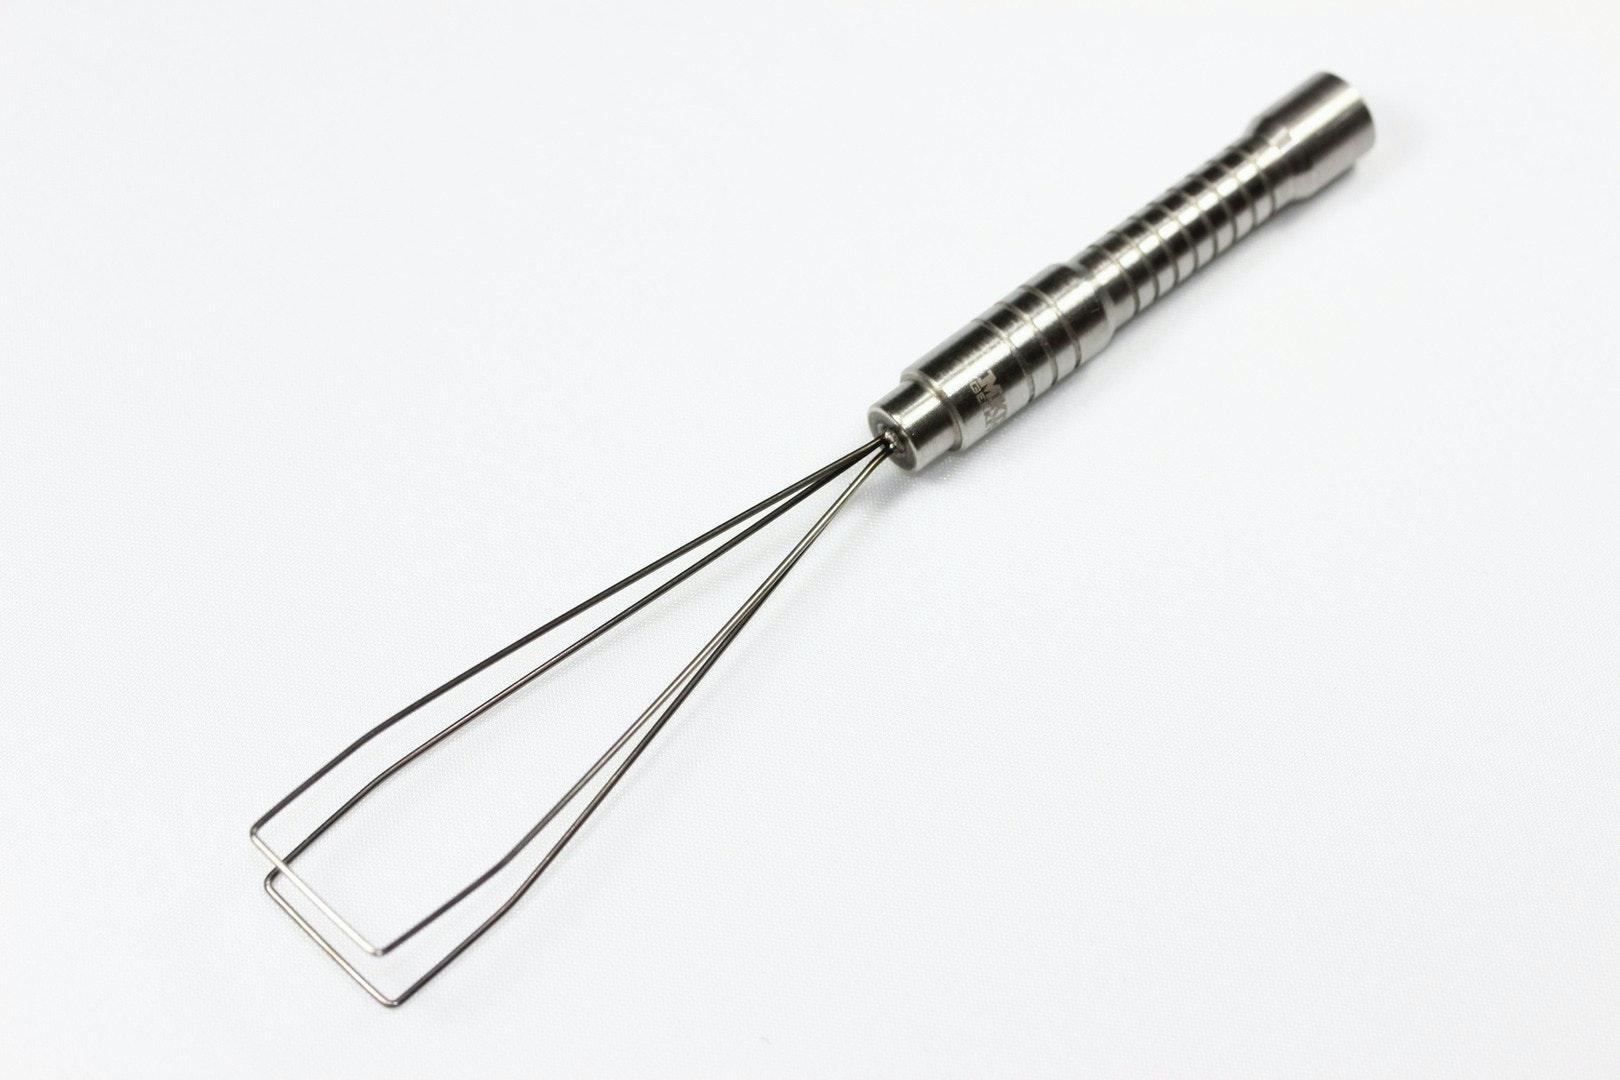 MKC Stainless Steel Keycap Puller